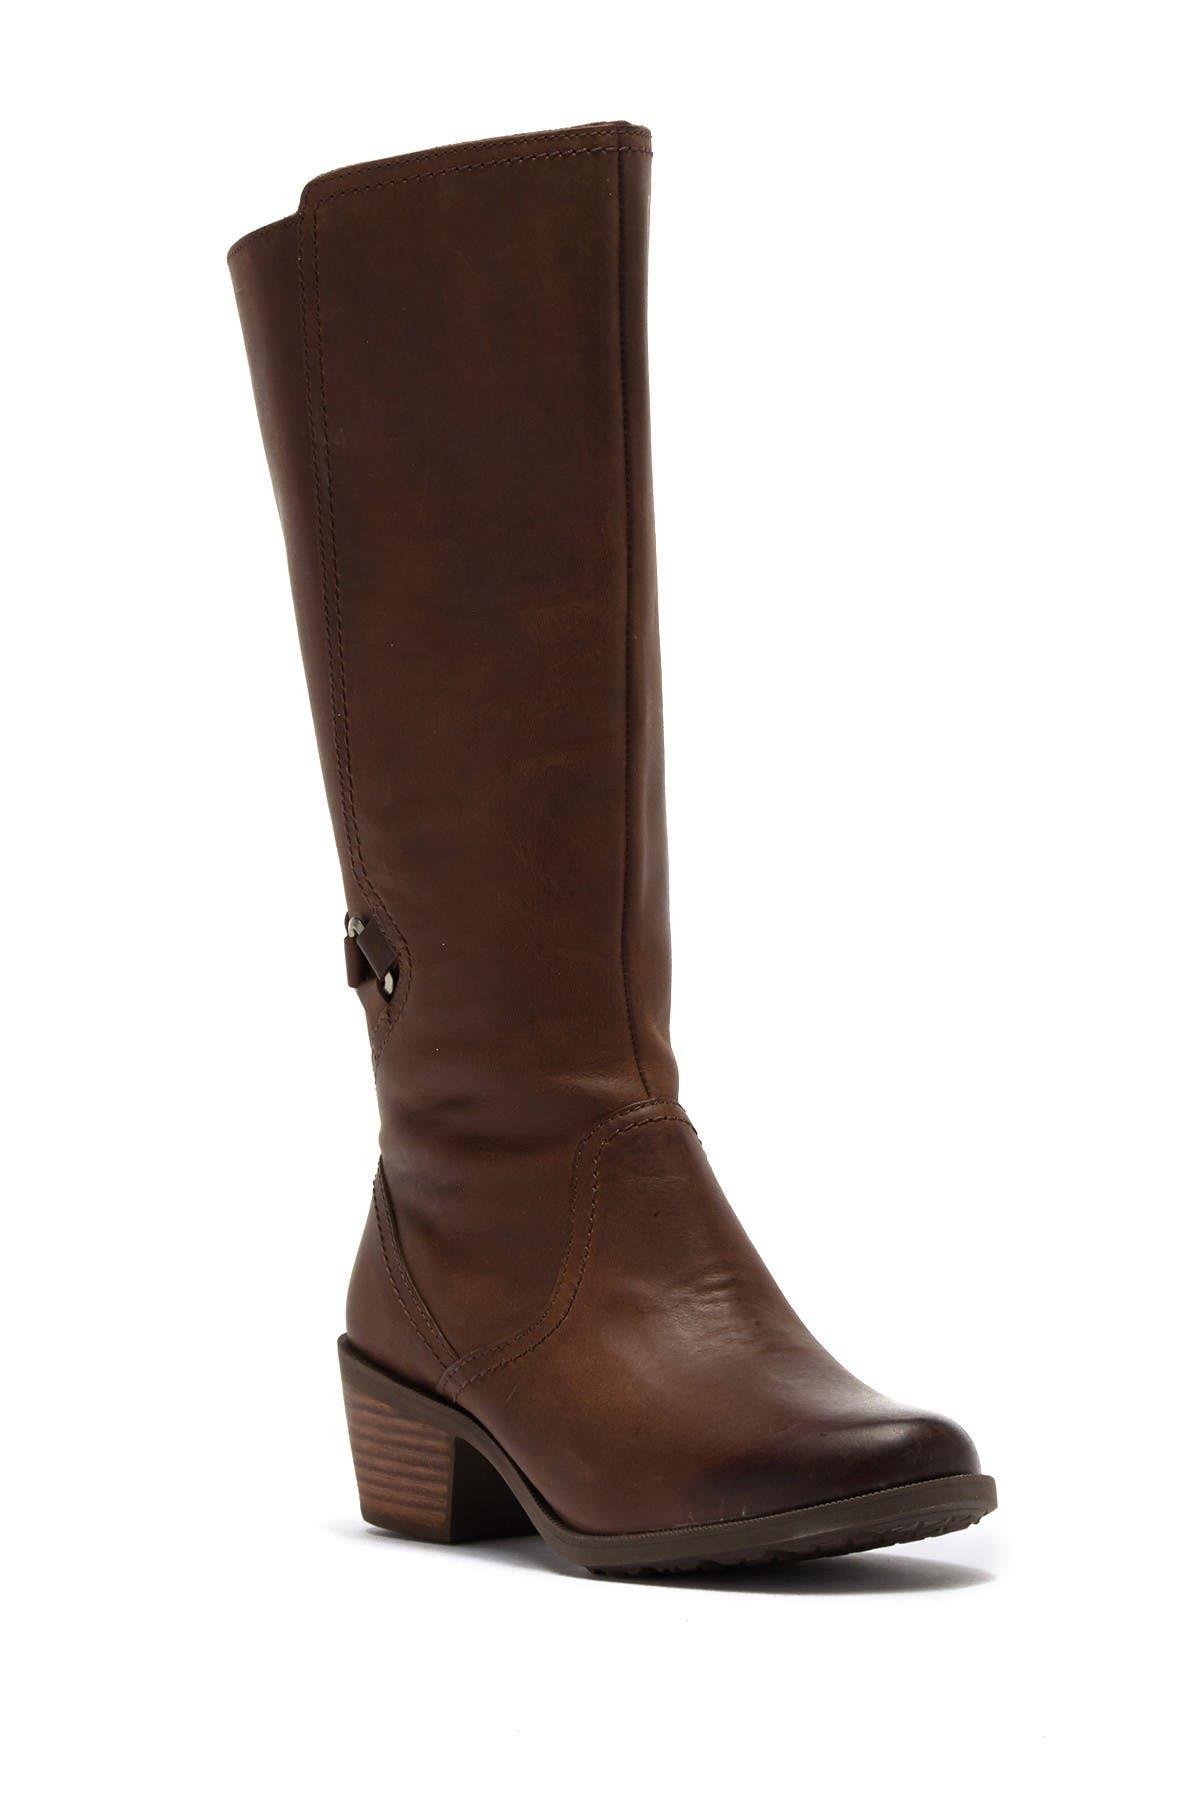 Teva | Foxy Tall Leather Boot